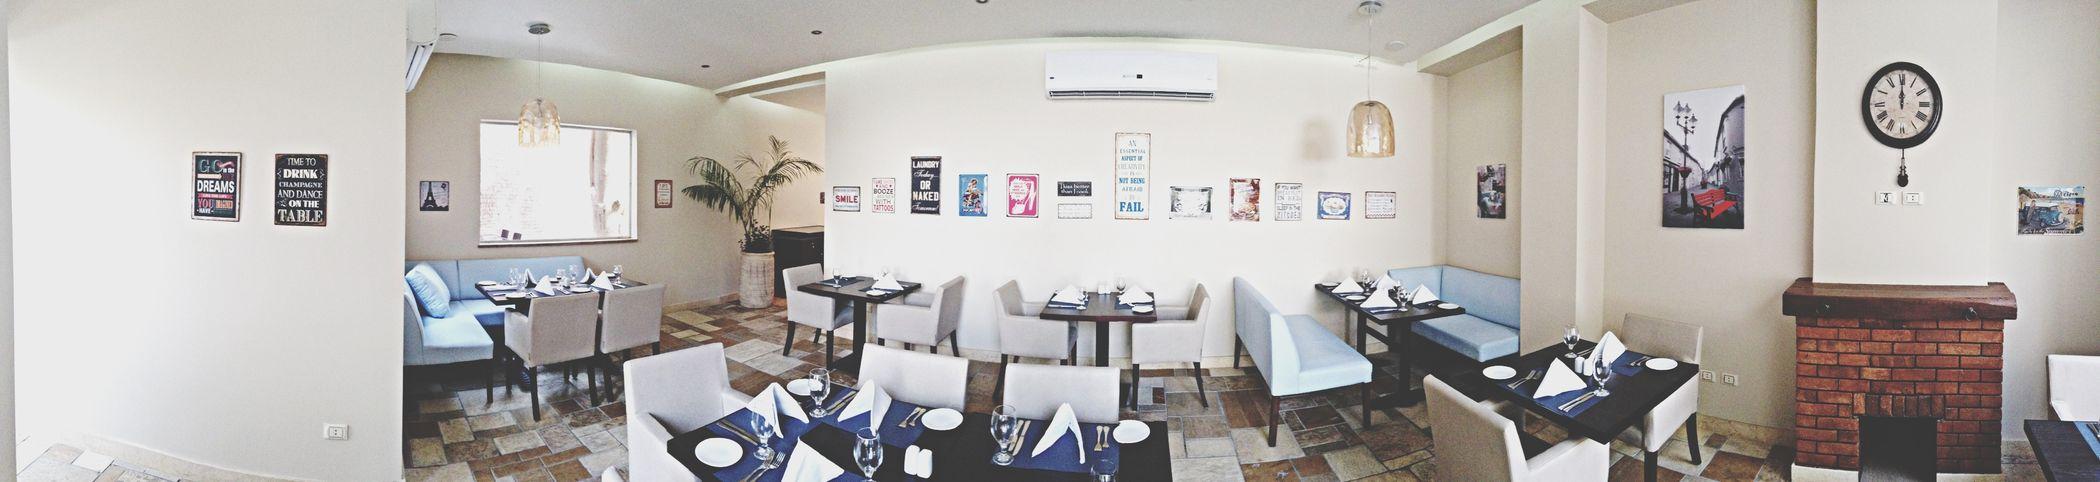 Resturant Maadi Amazing Place